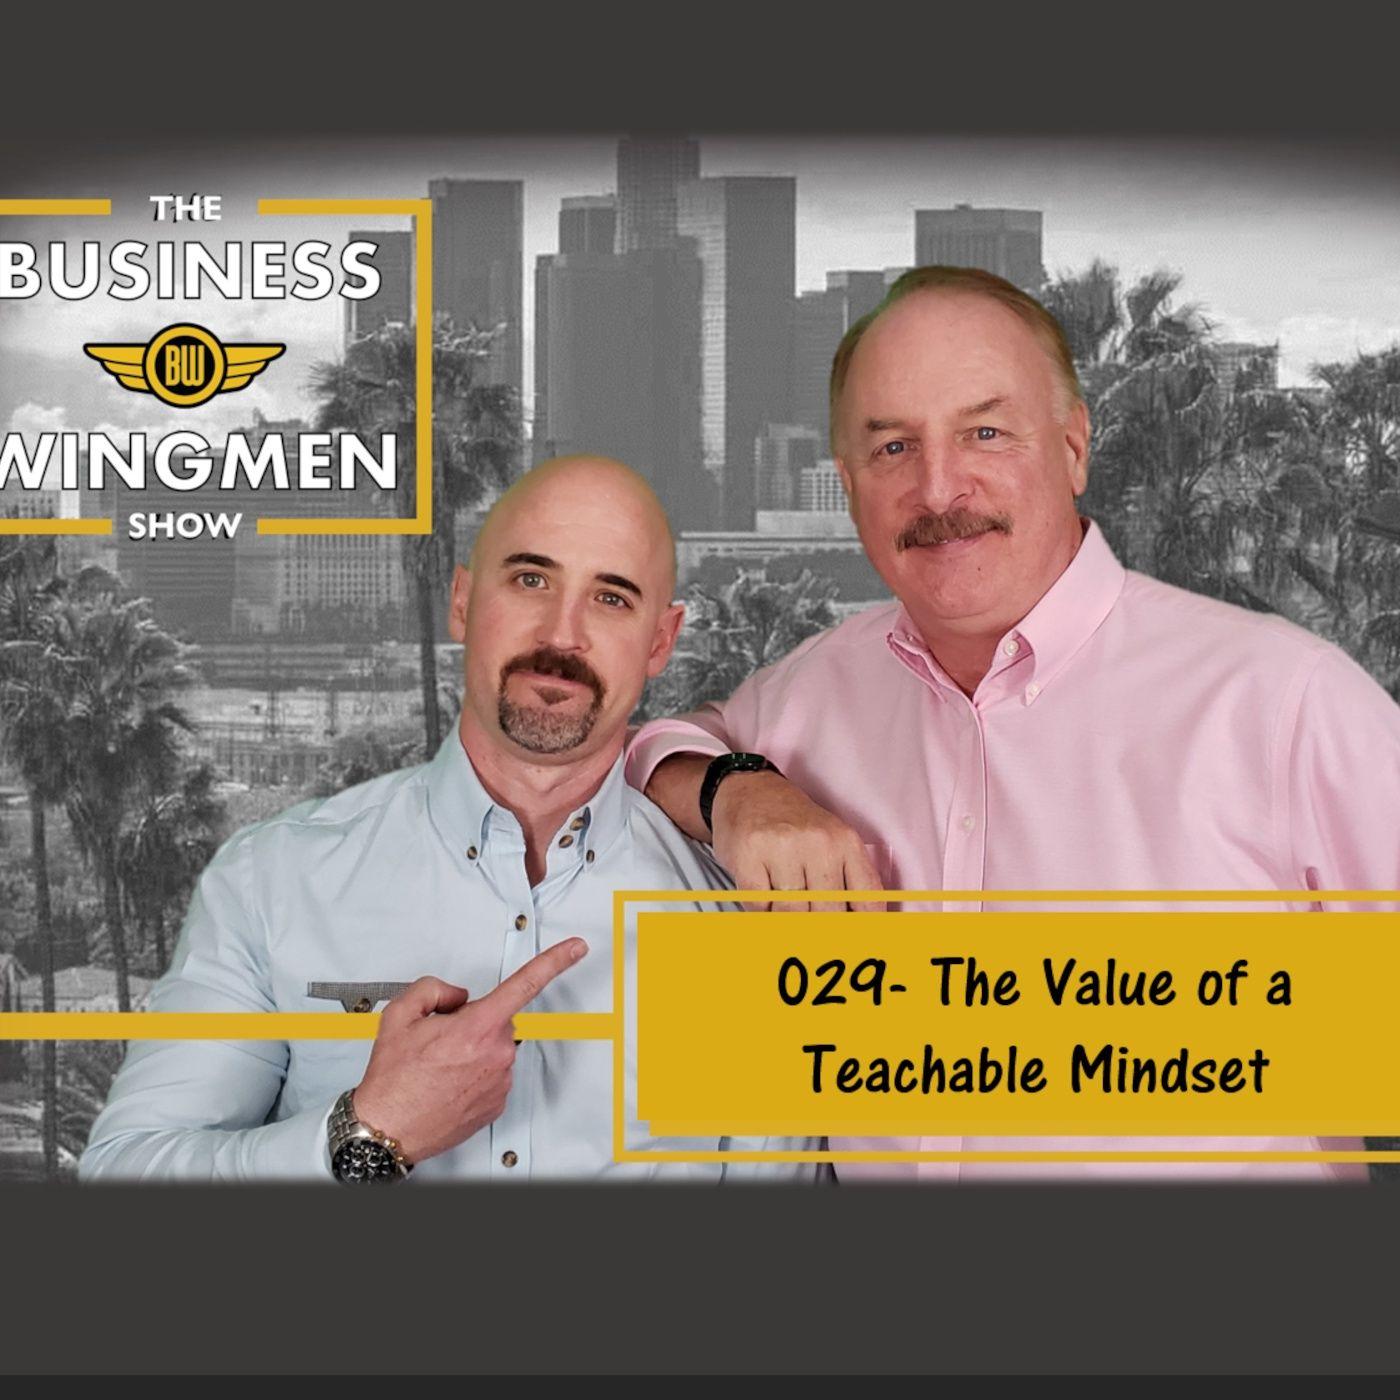 029- The Value of a Teachable Mindset